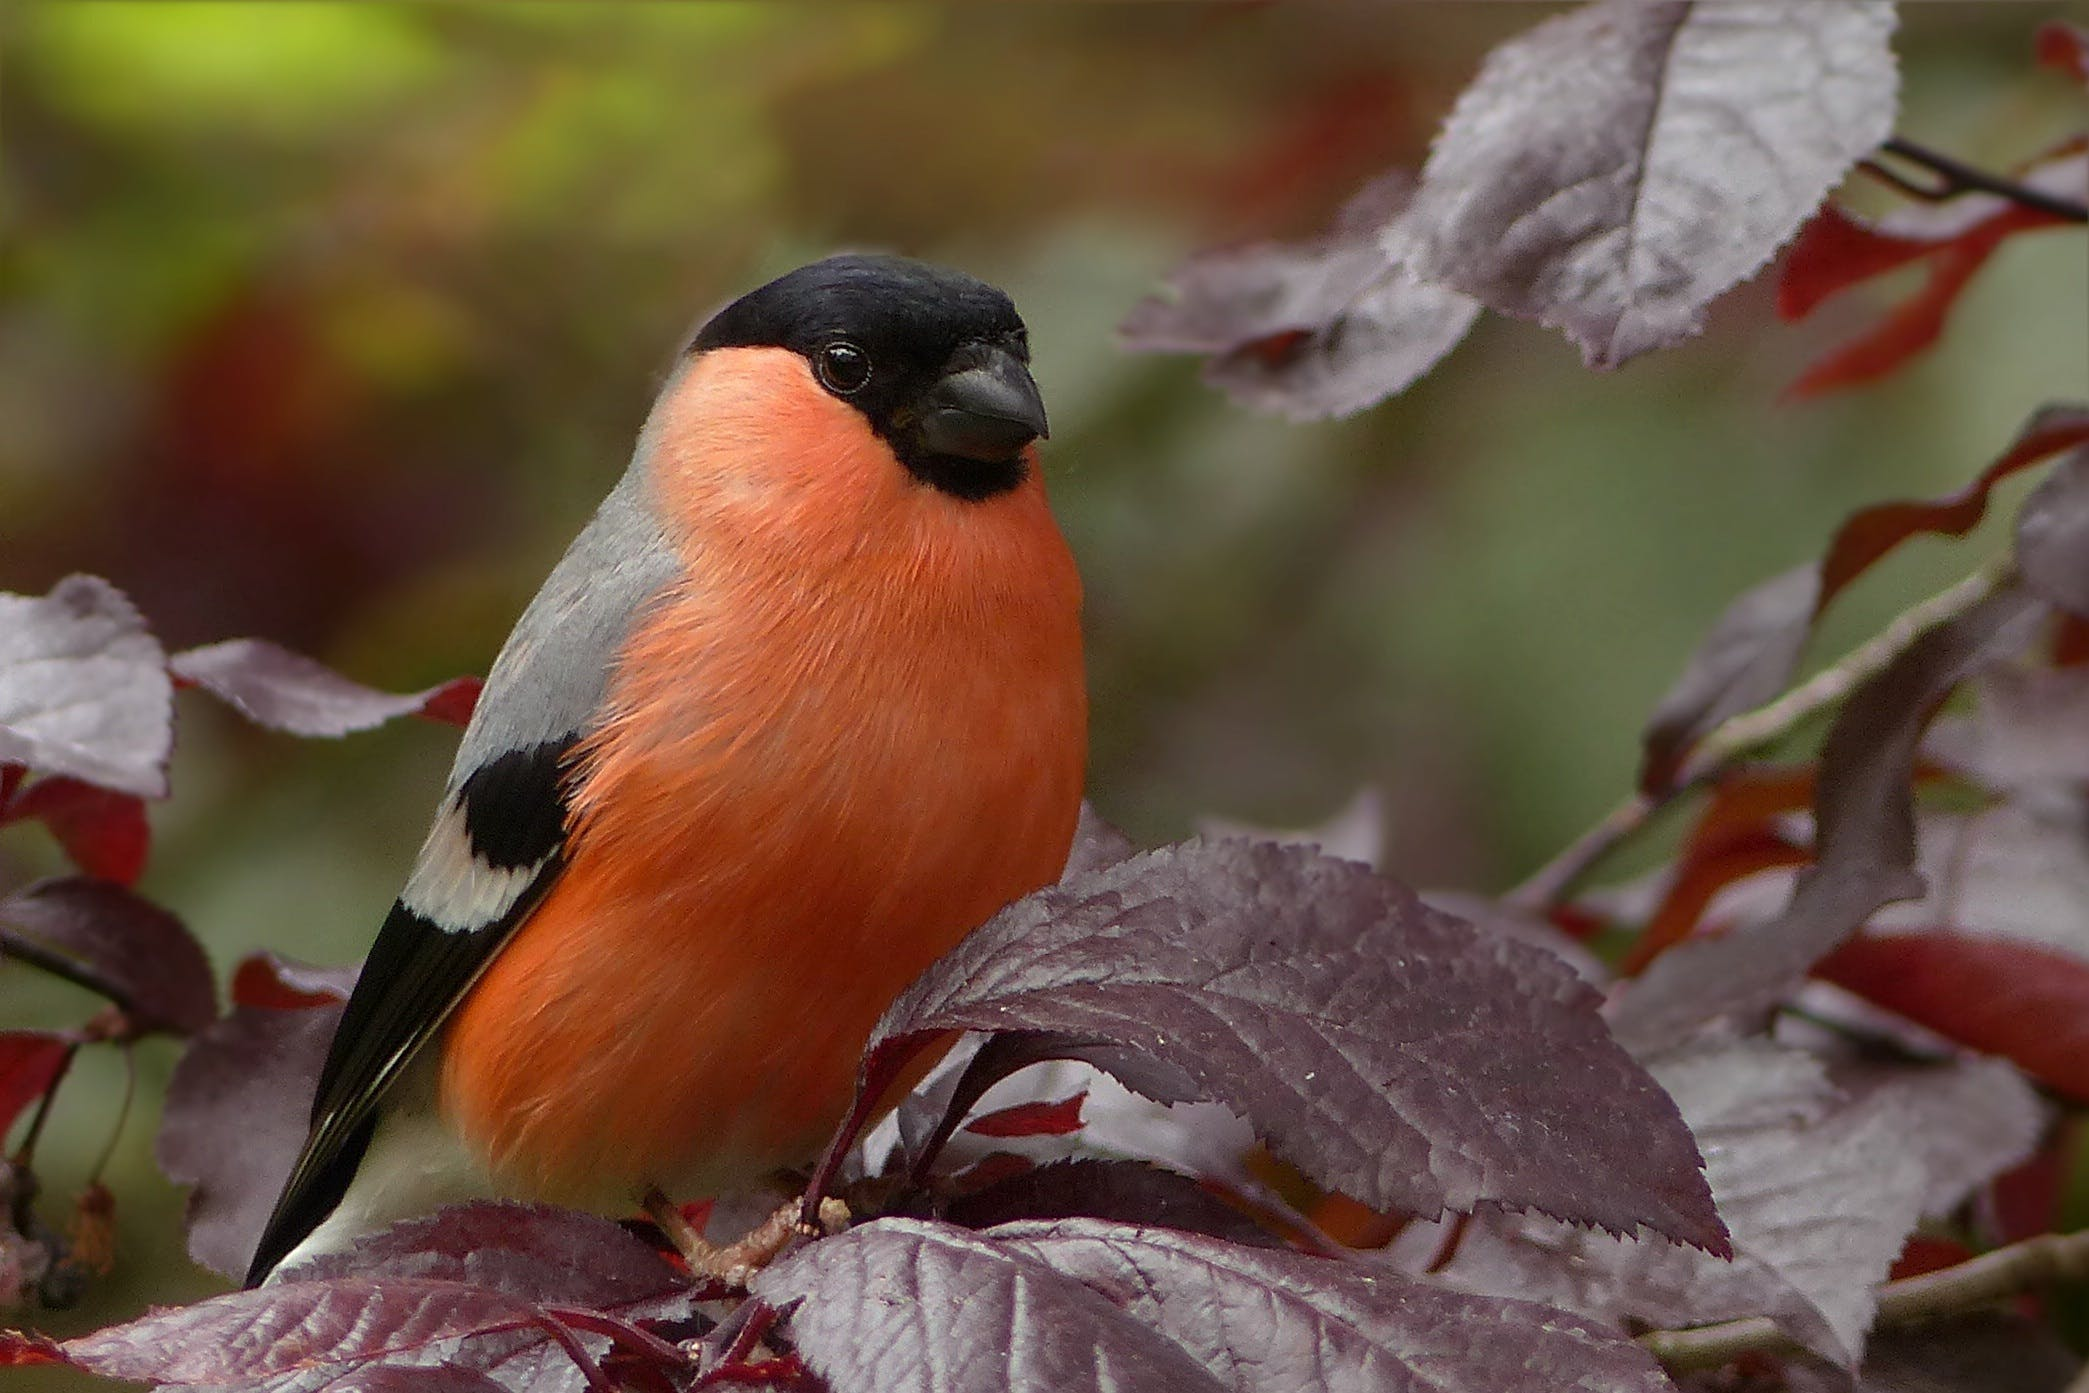 Black Gray and Orange Bird